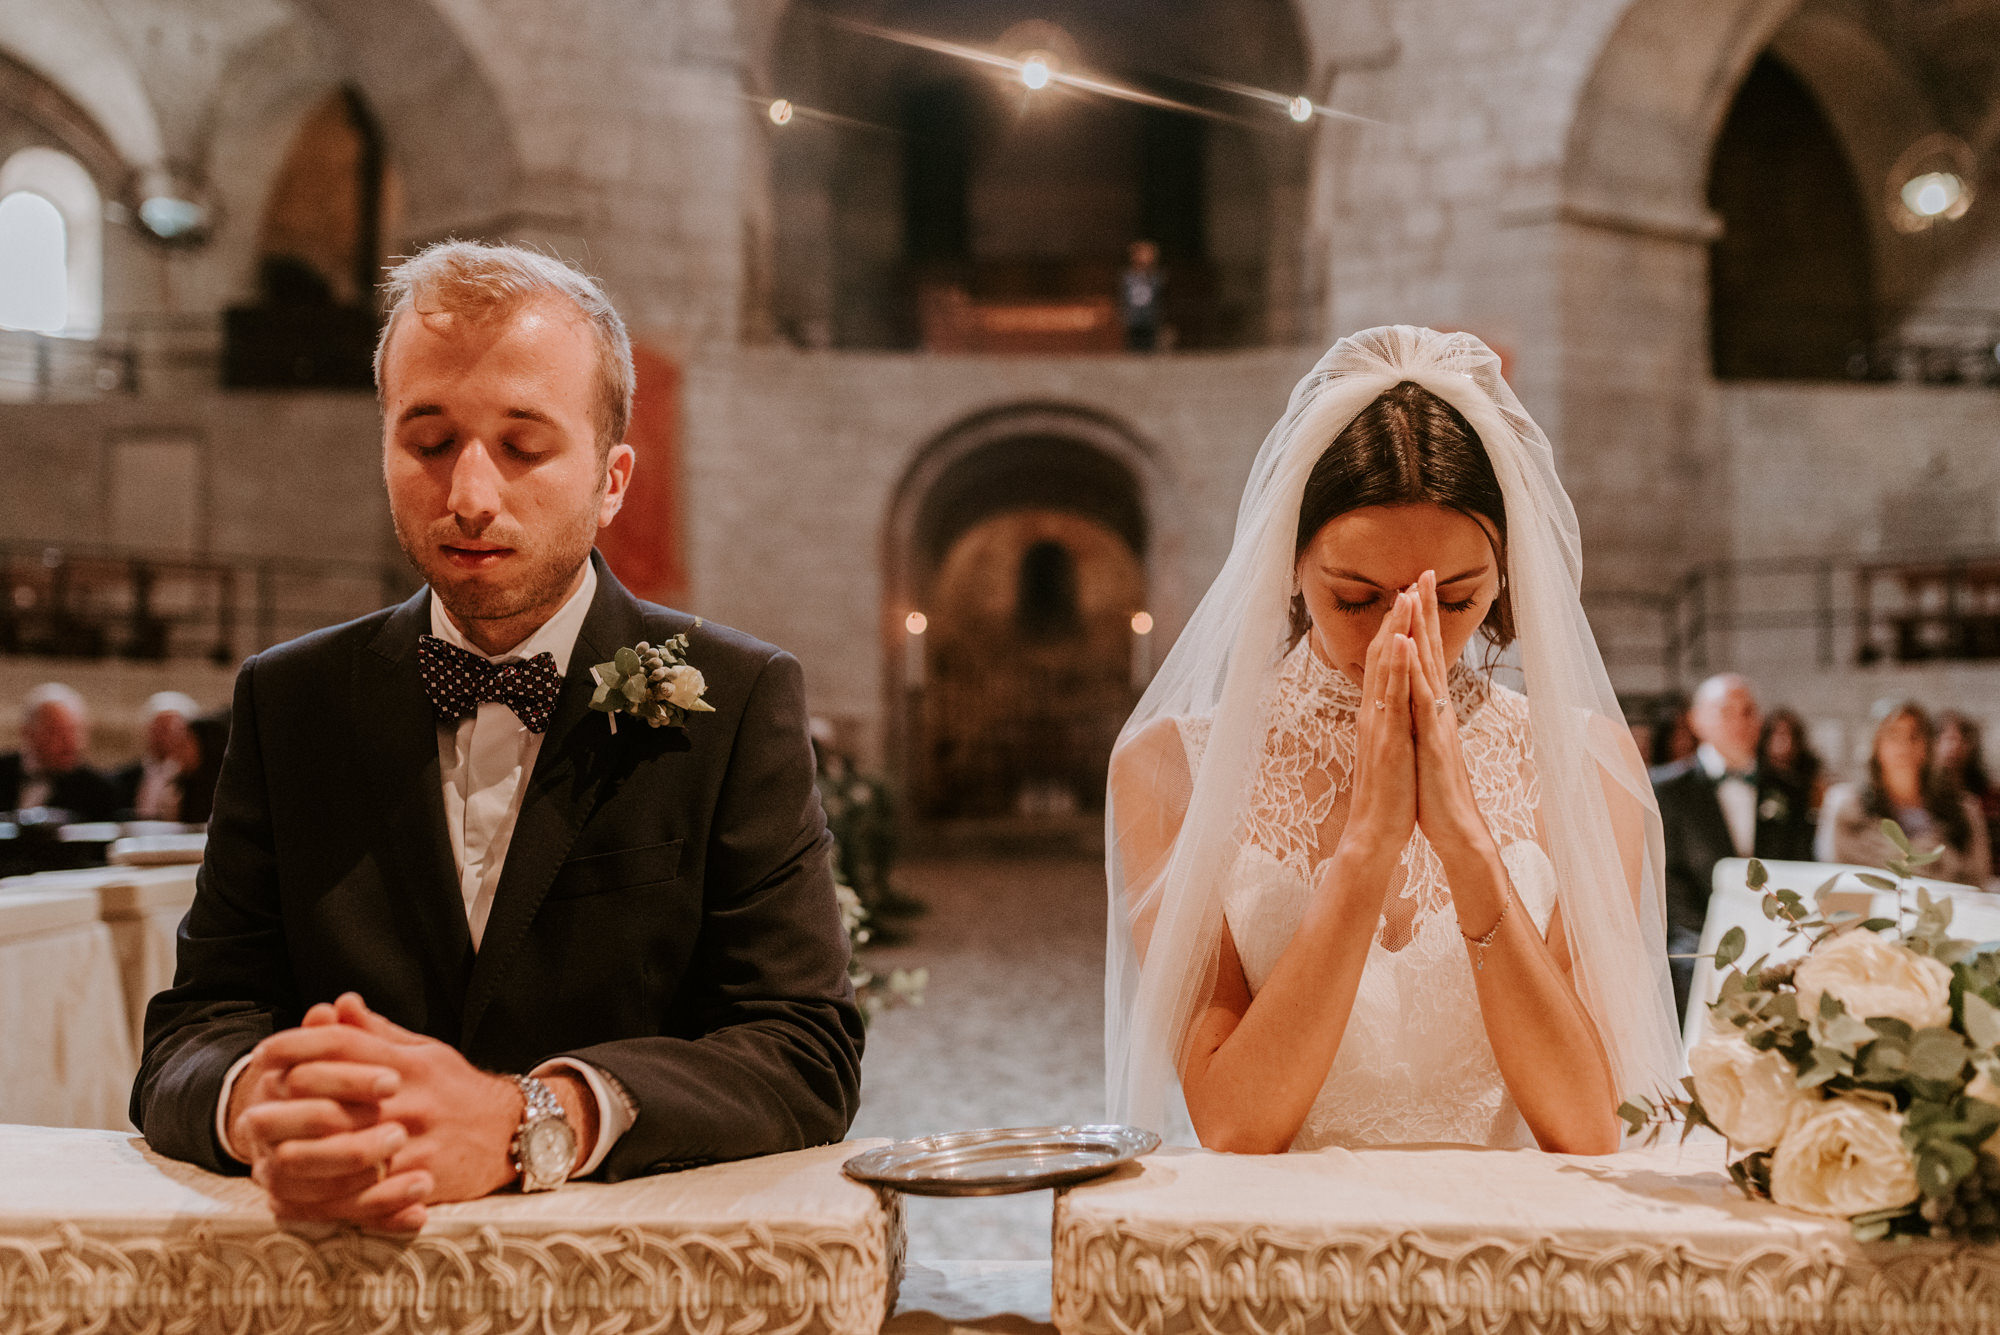 FOTO+PHOTO+BODA+WEDDING+ITALIA+ITALY+MAURICIO+GARAY+MAURICIOGARAY+WEDDINPHOTOGRAPHER+FOTOGRAFODEBODA-987.jpg